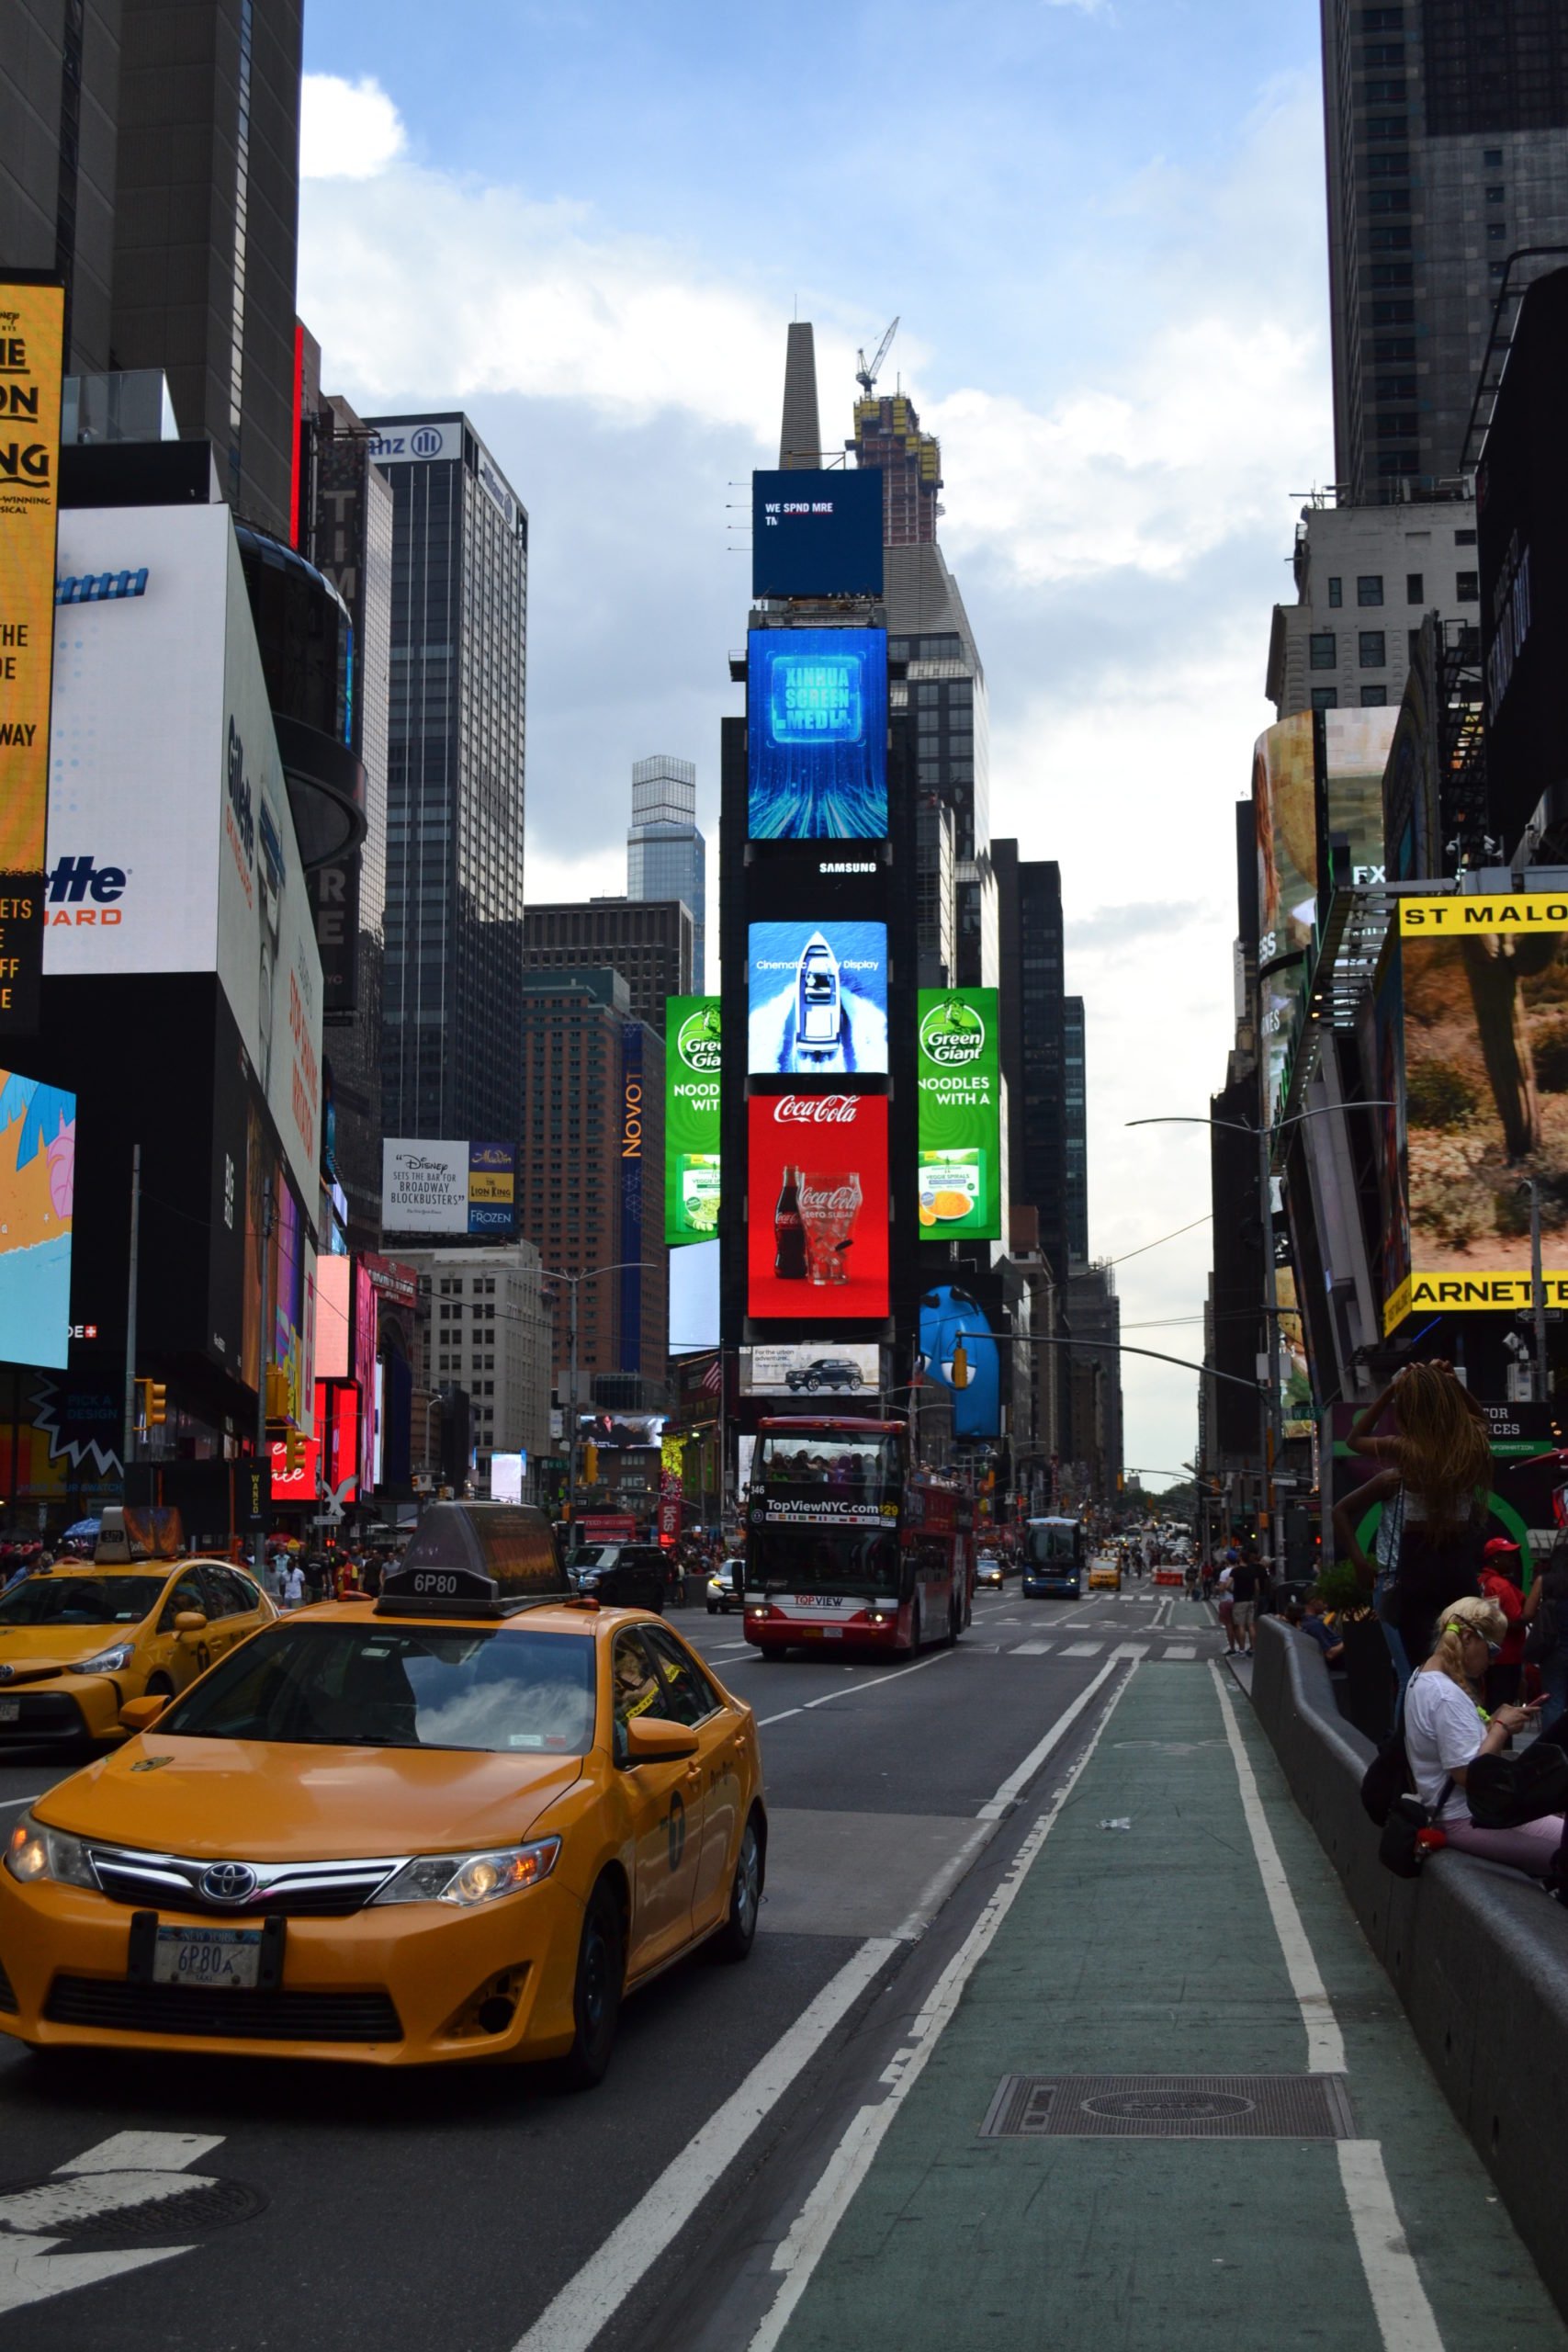 El arte se toma New York